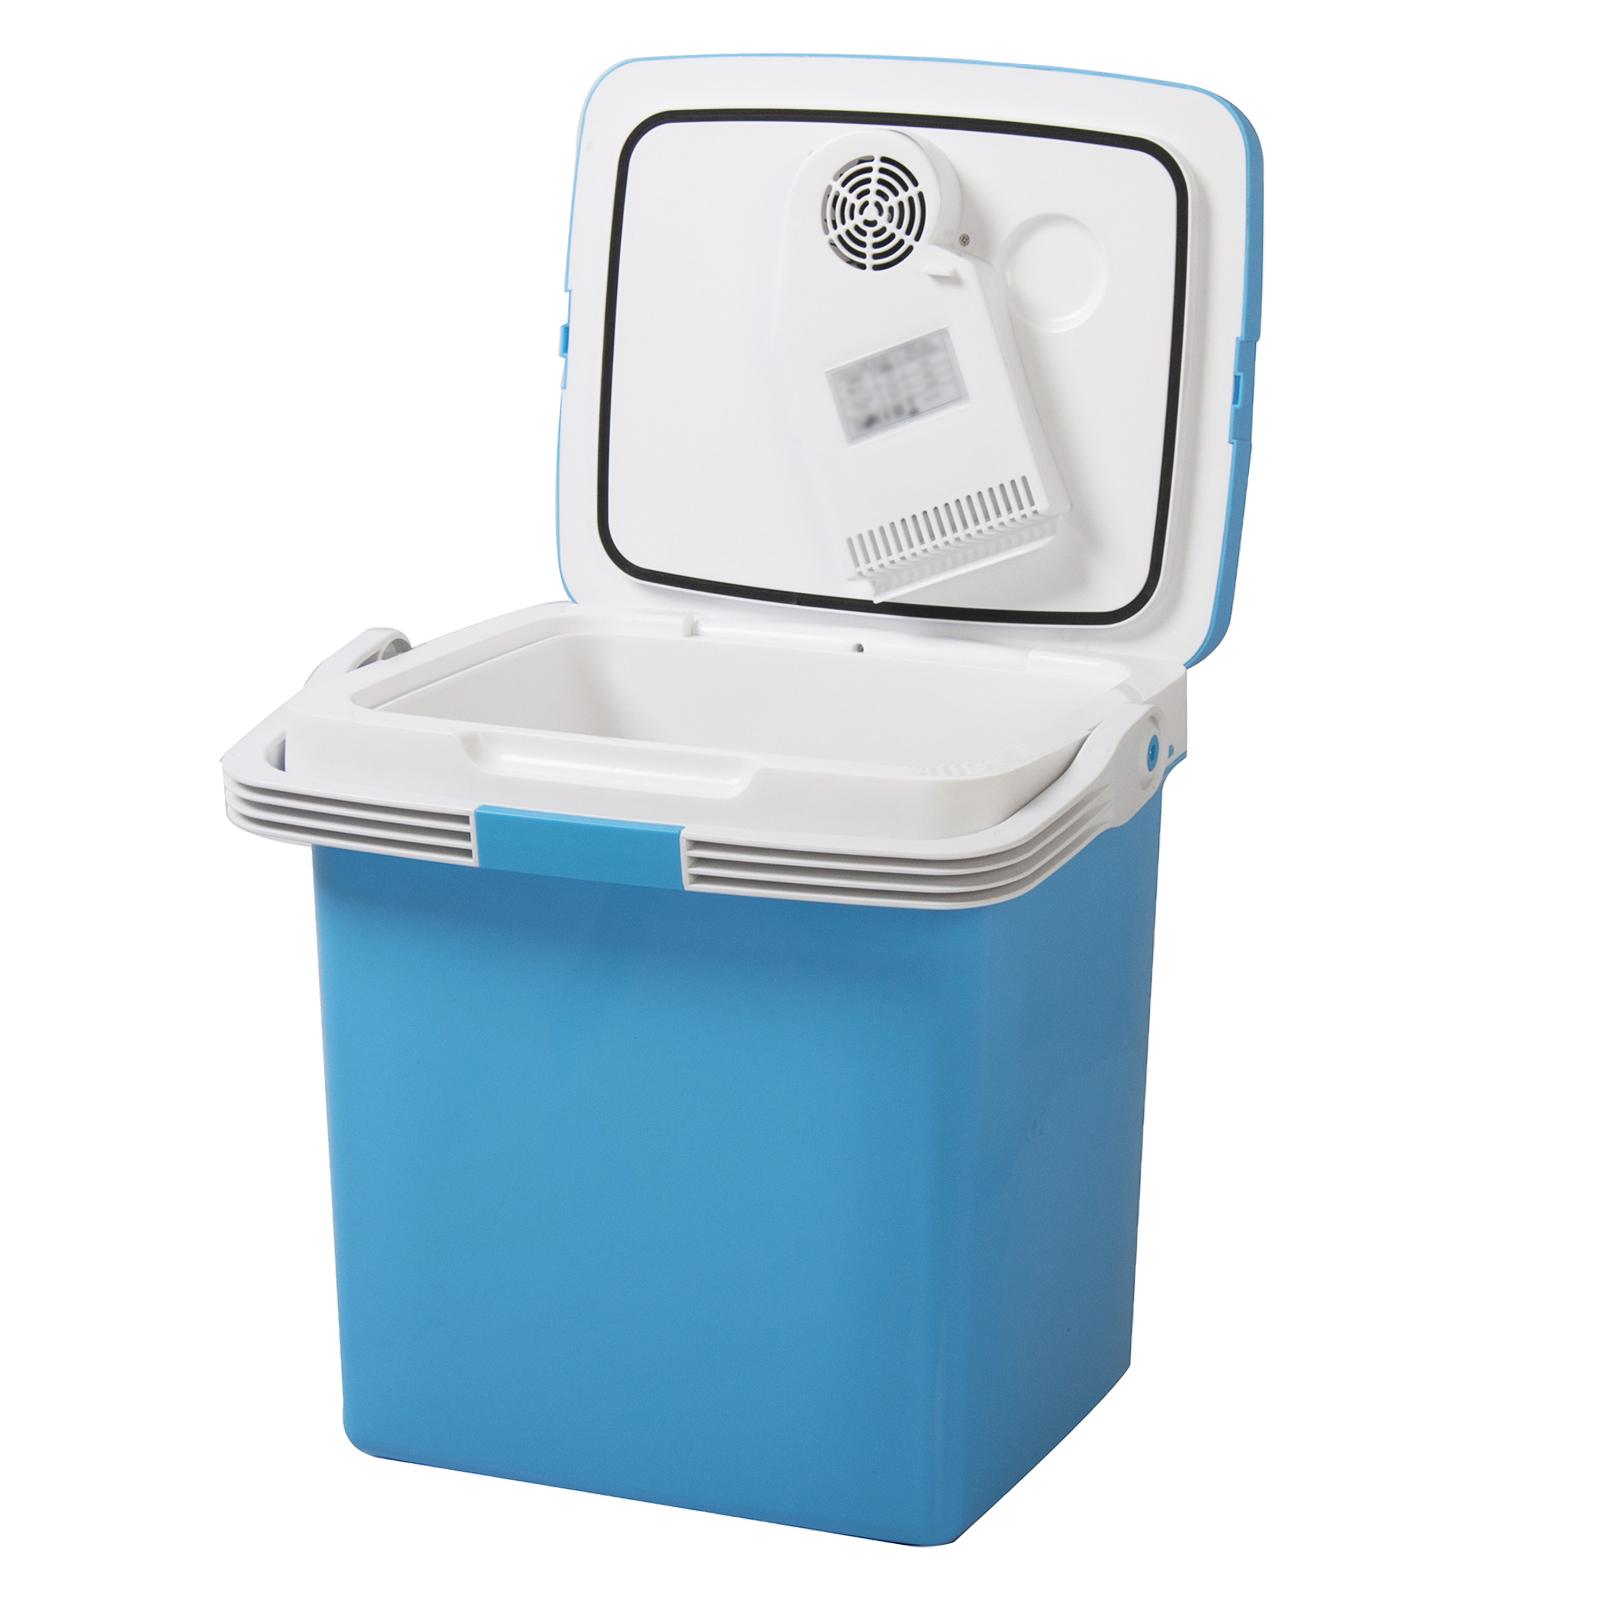 Großzügig Minikühlschrank Ebay Zeitgenössisch - Heimat Ideen ...